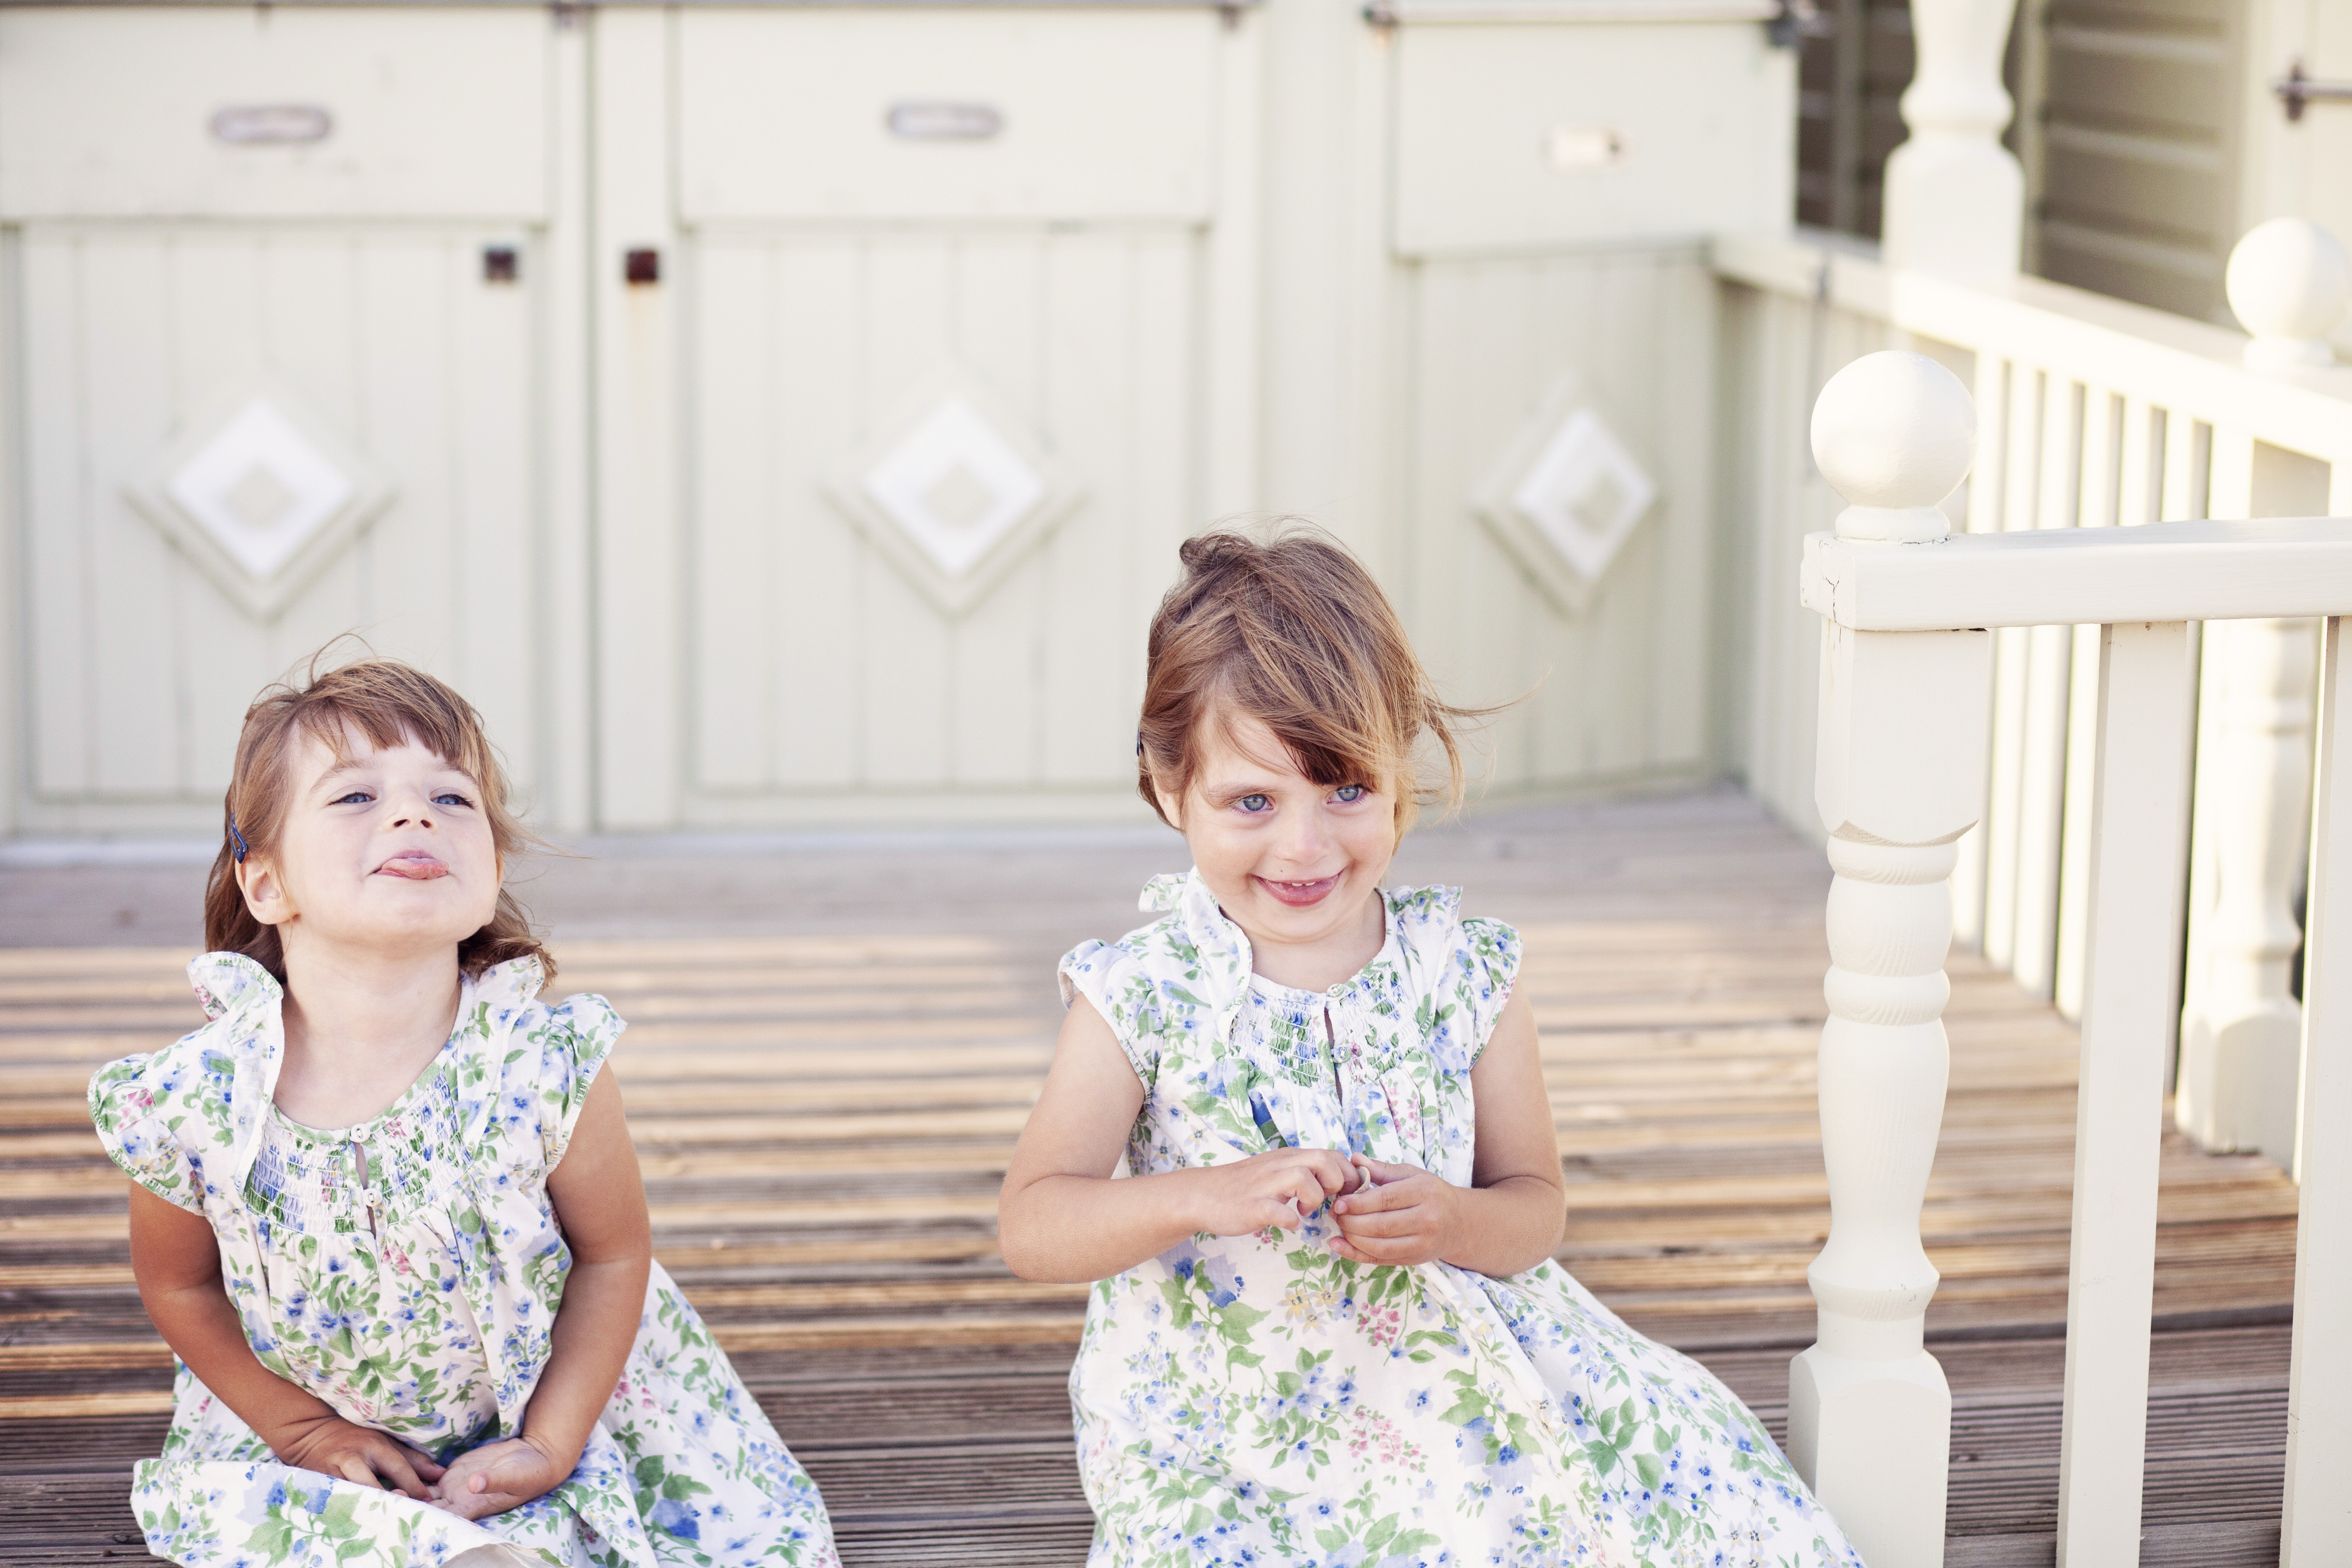 Twins playing on a beach hut